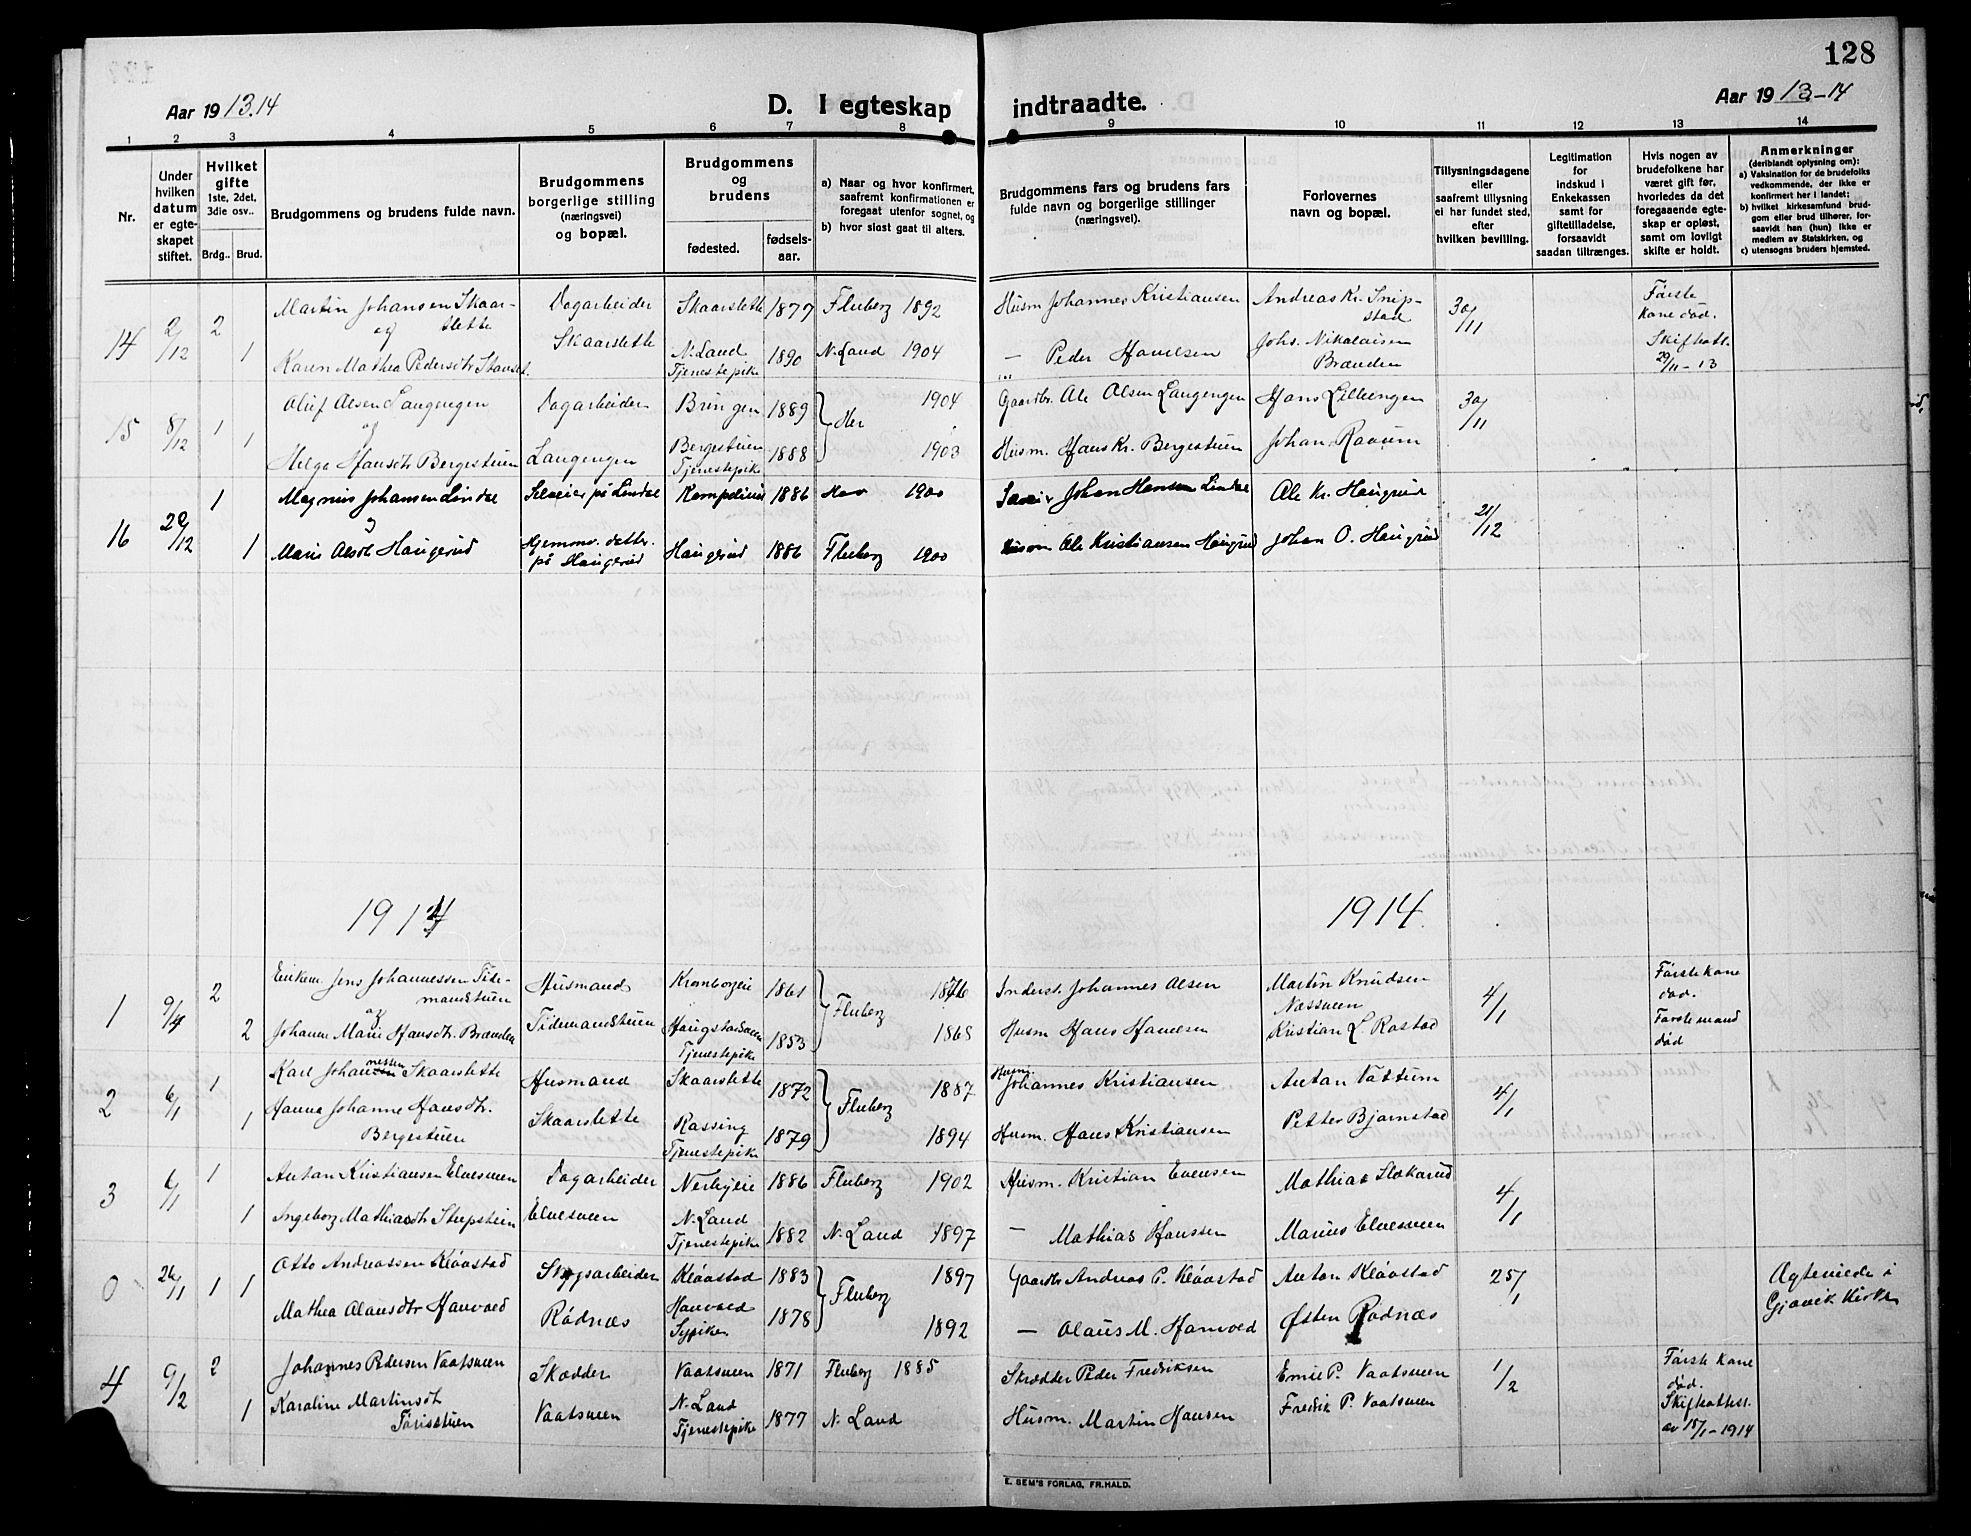 SAH, Søndre Land prestekontor, L/L0006: Klokkerbok nr. 6, 1912-1925, s. 128